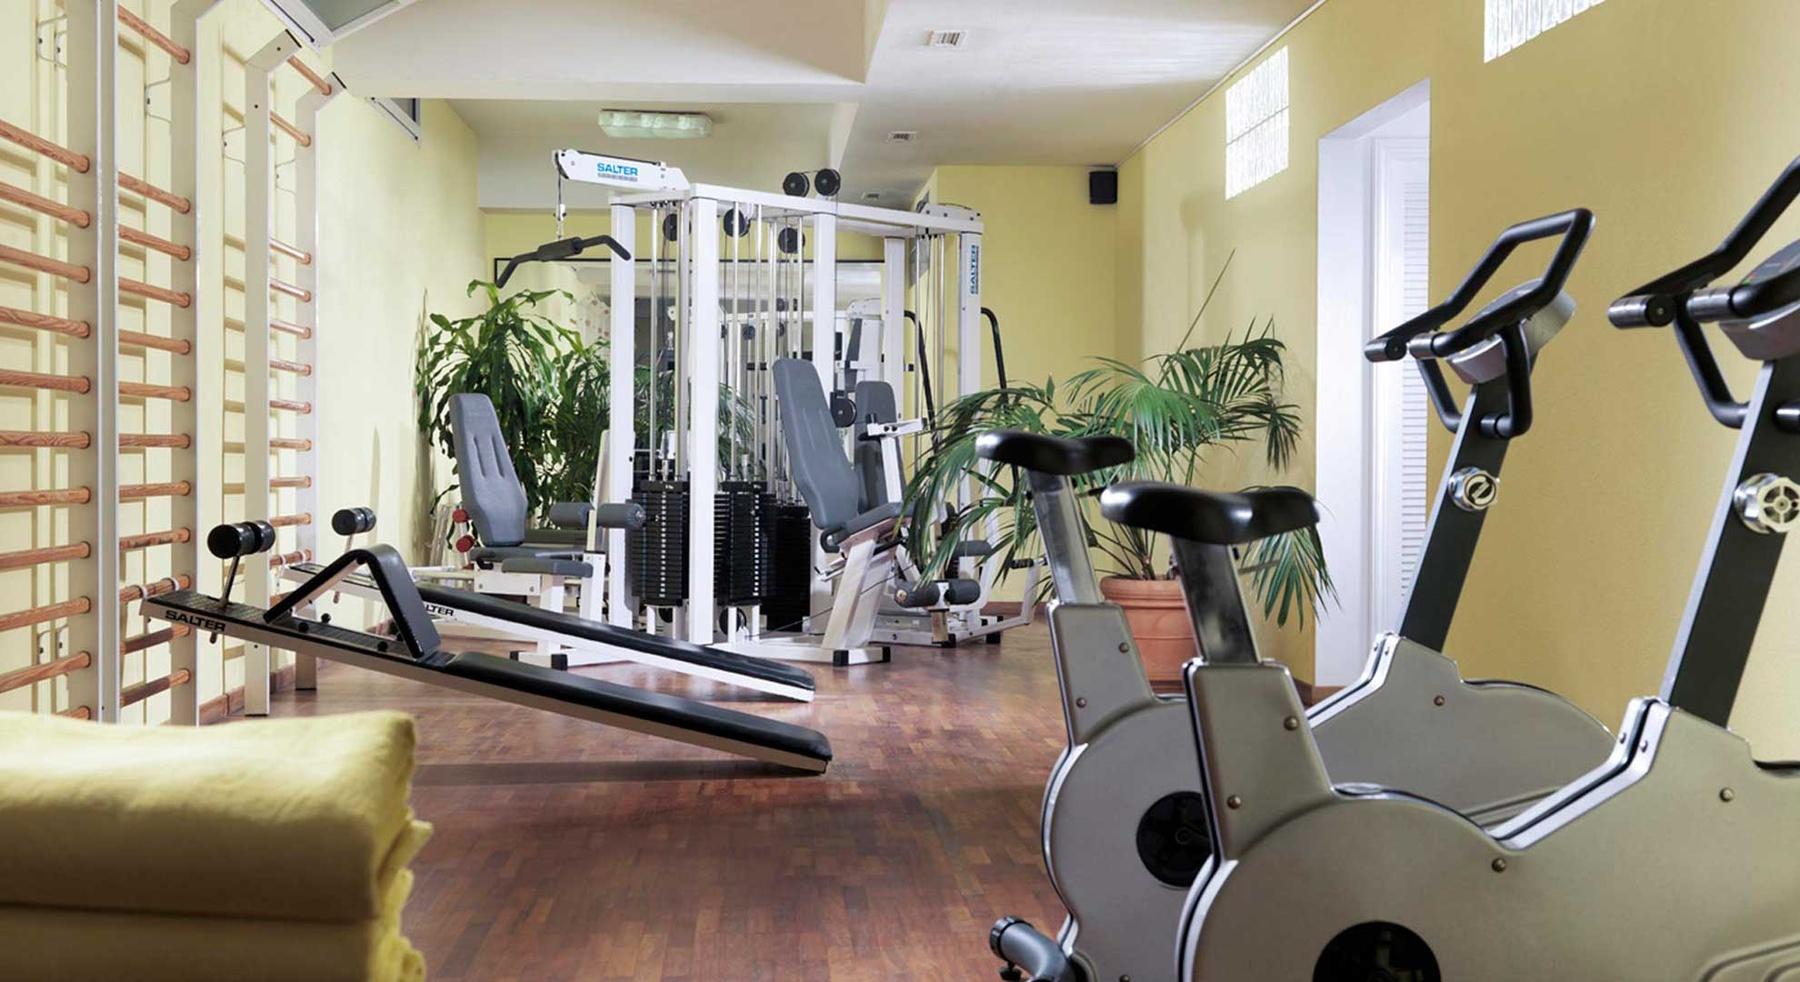 Fitness Club Atlantis Dunapark Corralejo